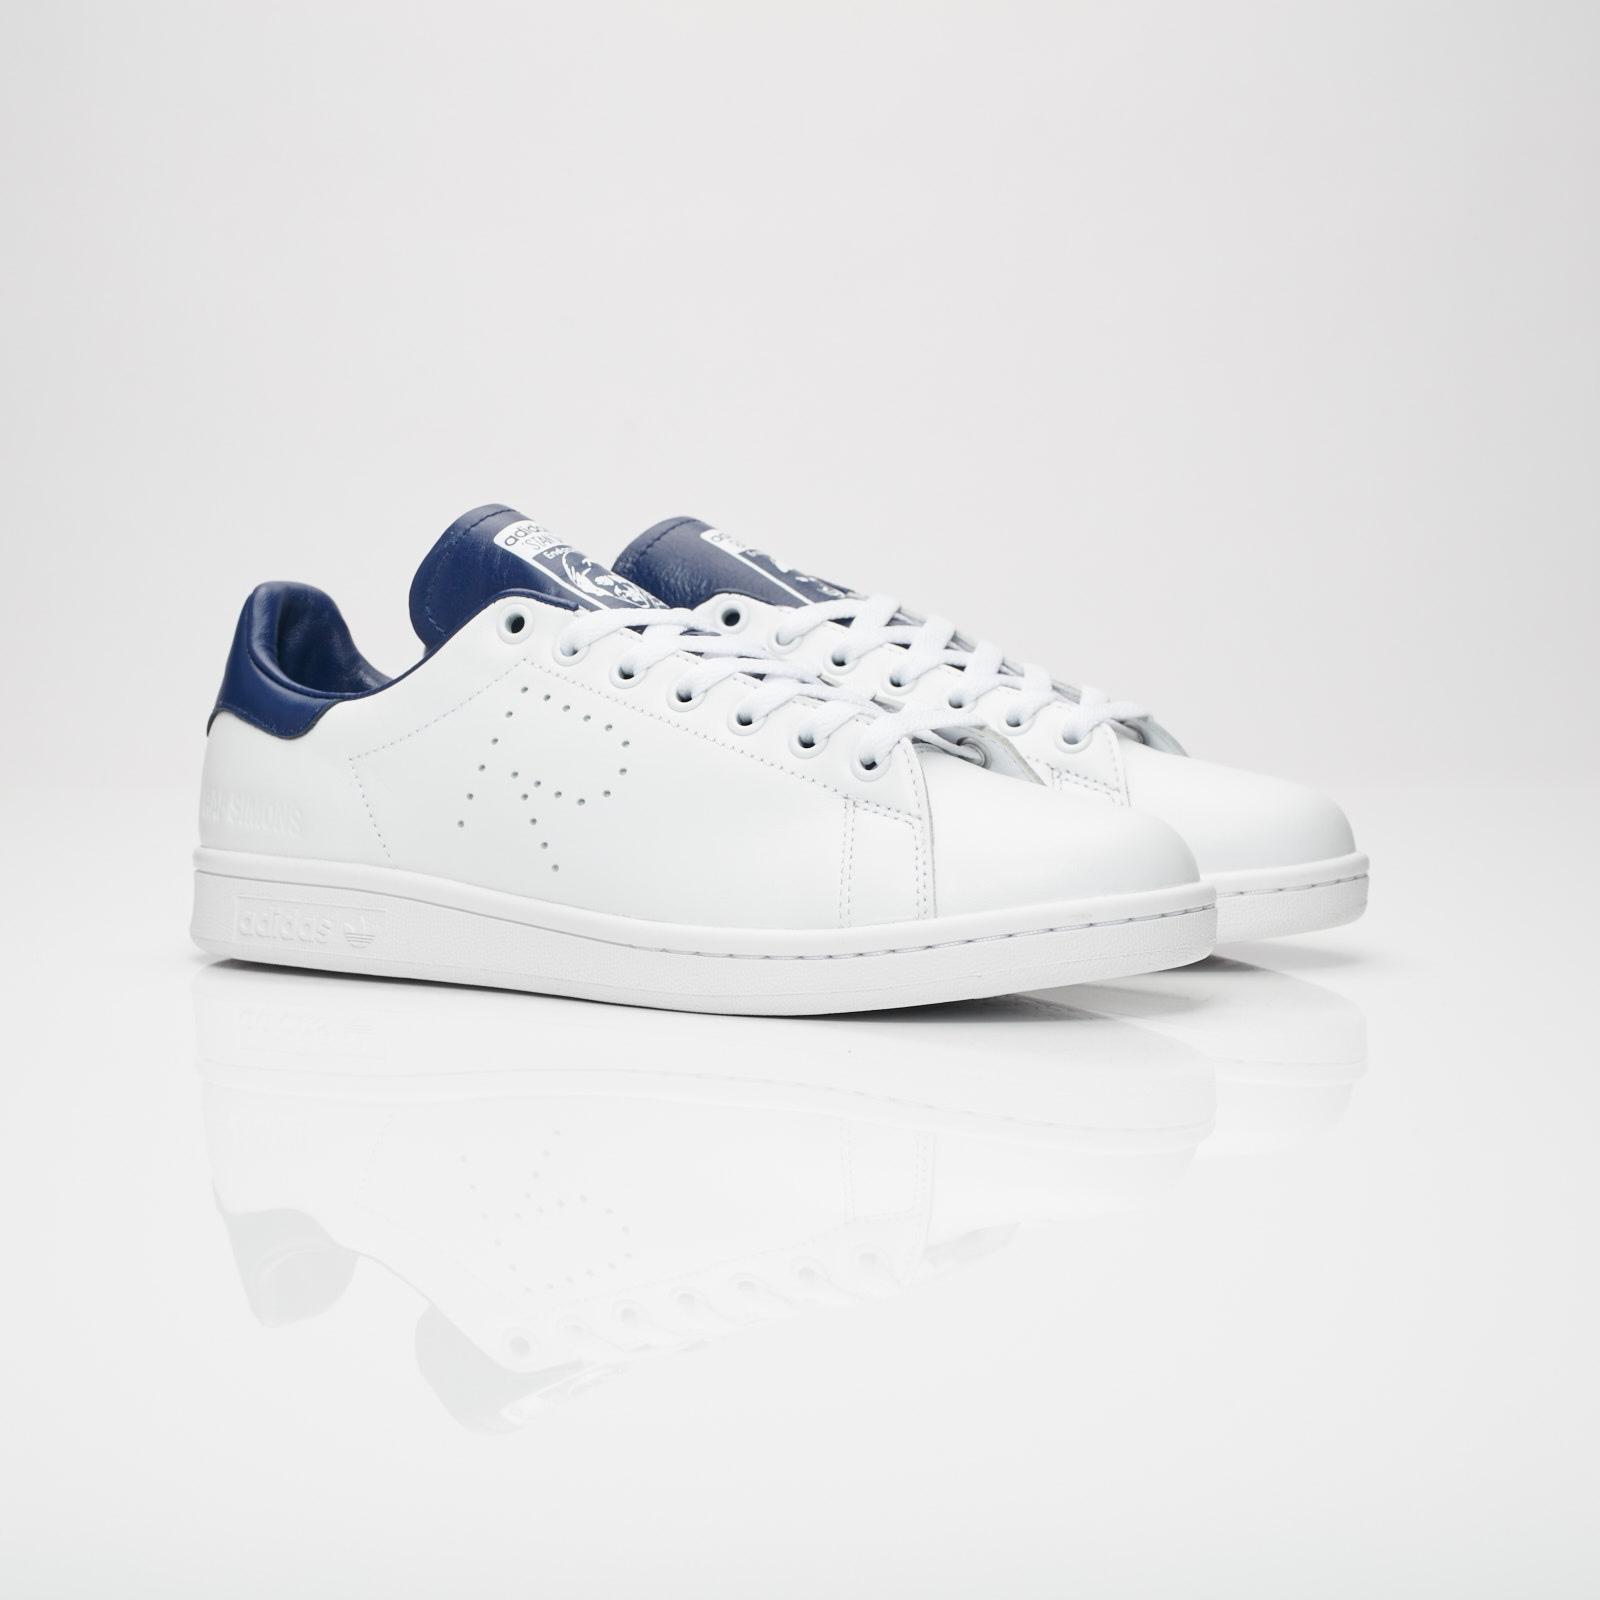 Adidas Stan Smith b22543 Raf Simons sneakersnstuff Sneakers